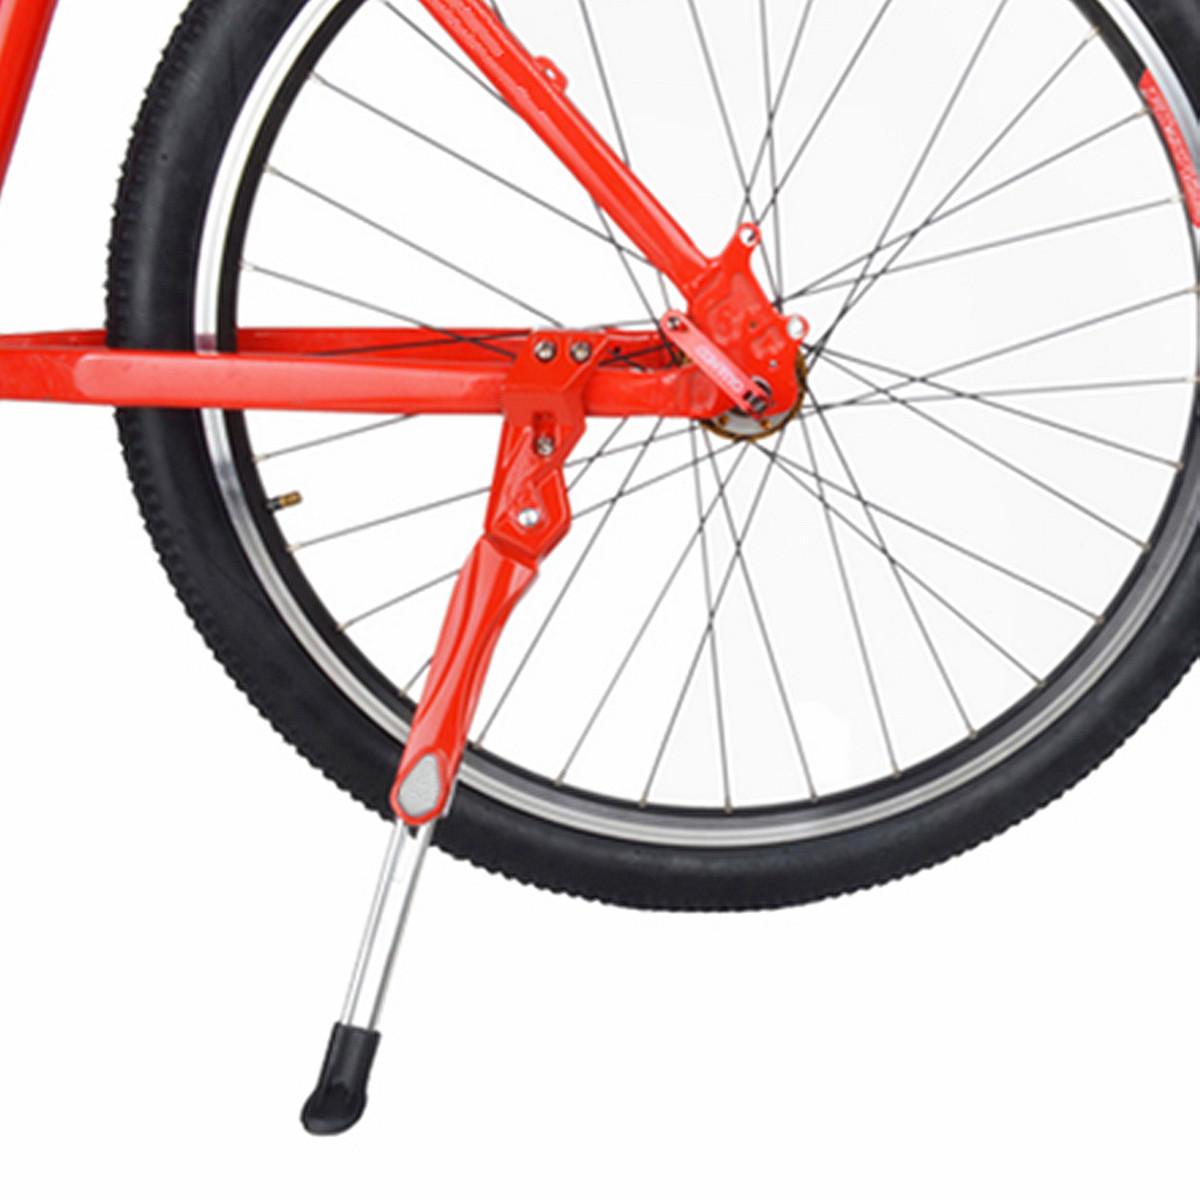 Universal Bike Kickstand Alloy Adjustable Height Rear Side Bicycle Kick Stand US